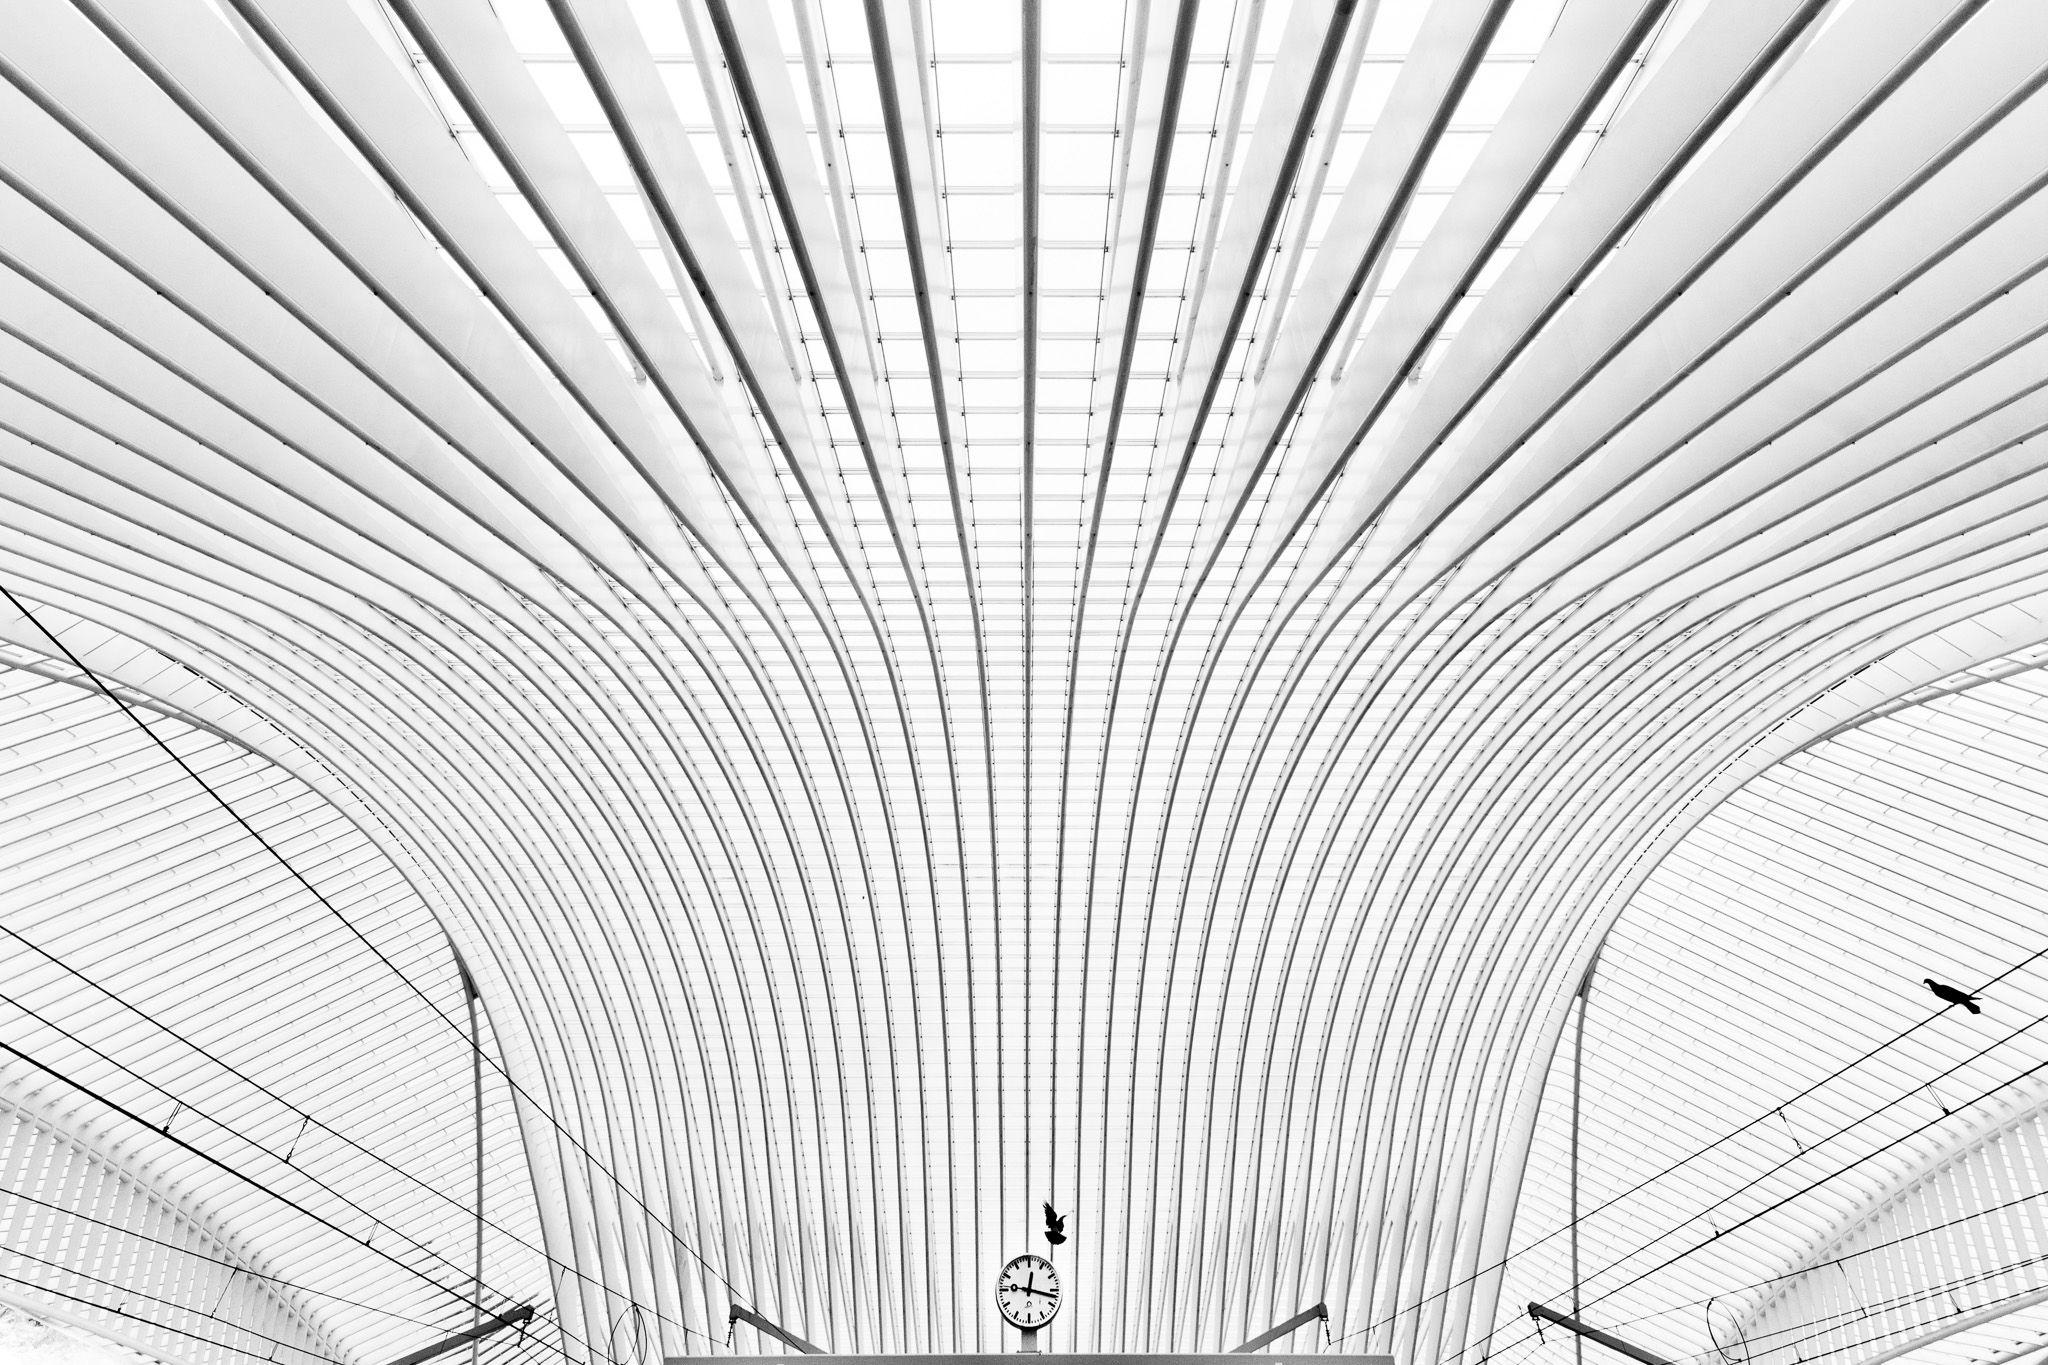 #Architecture #Photography #MatthiasHaker